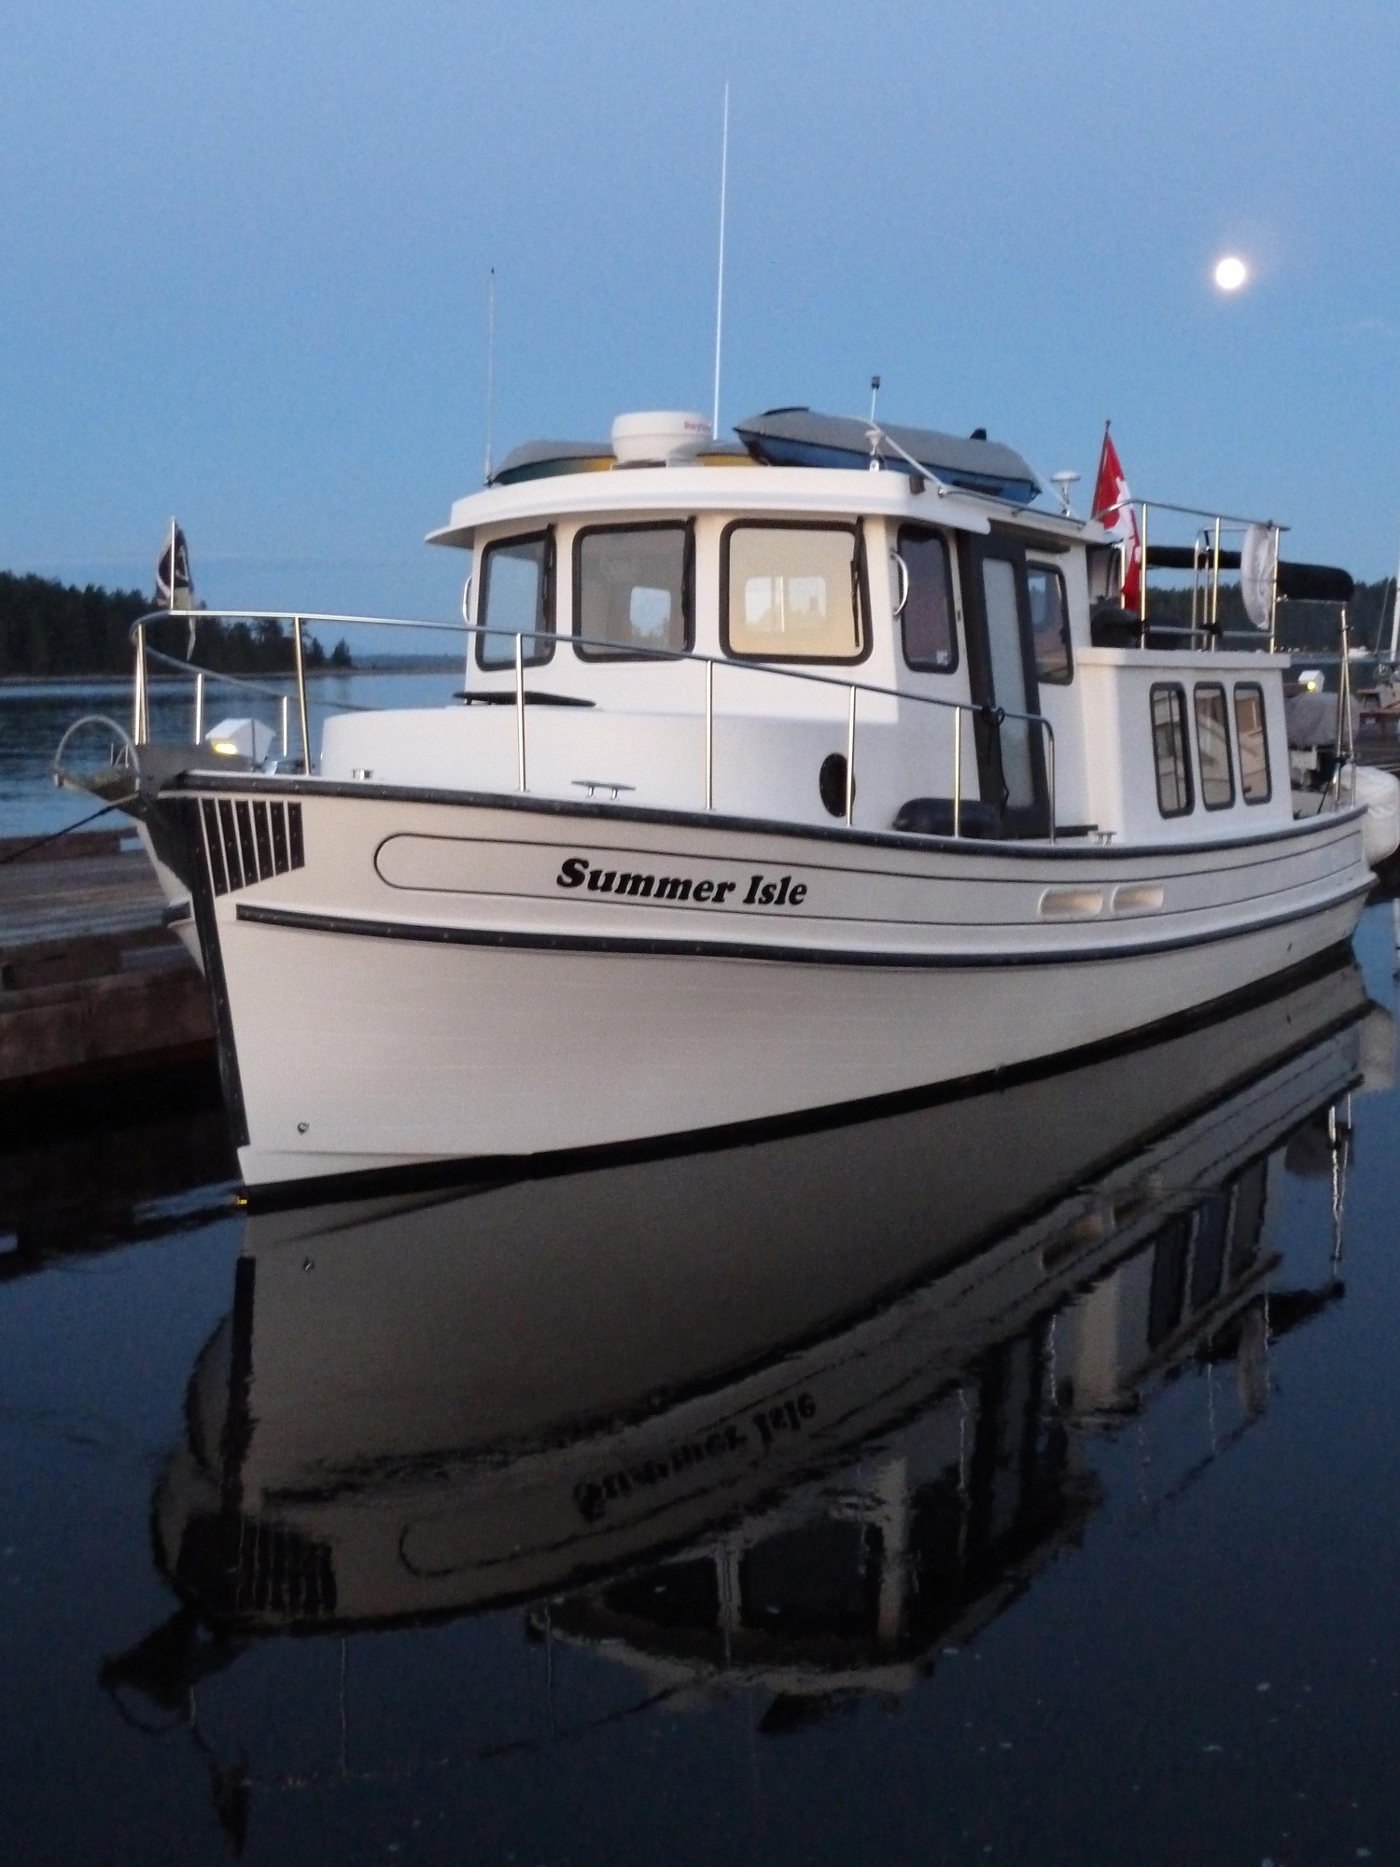 2001 Nordic Tugs 32 Pilothouse, Gulf Islands, Canada